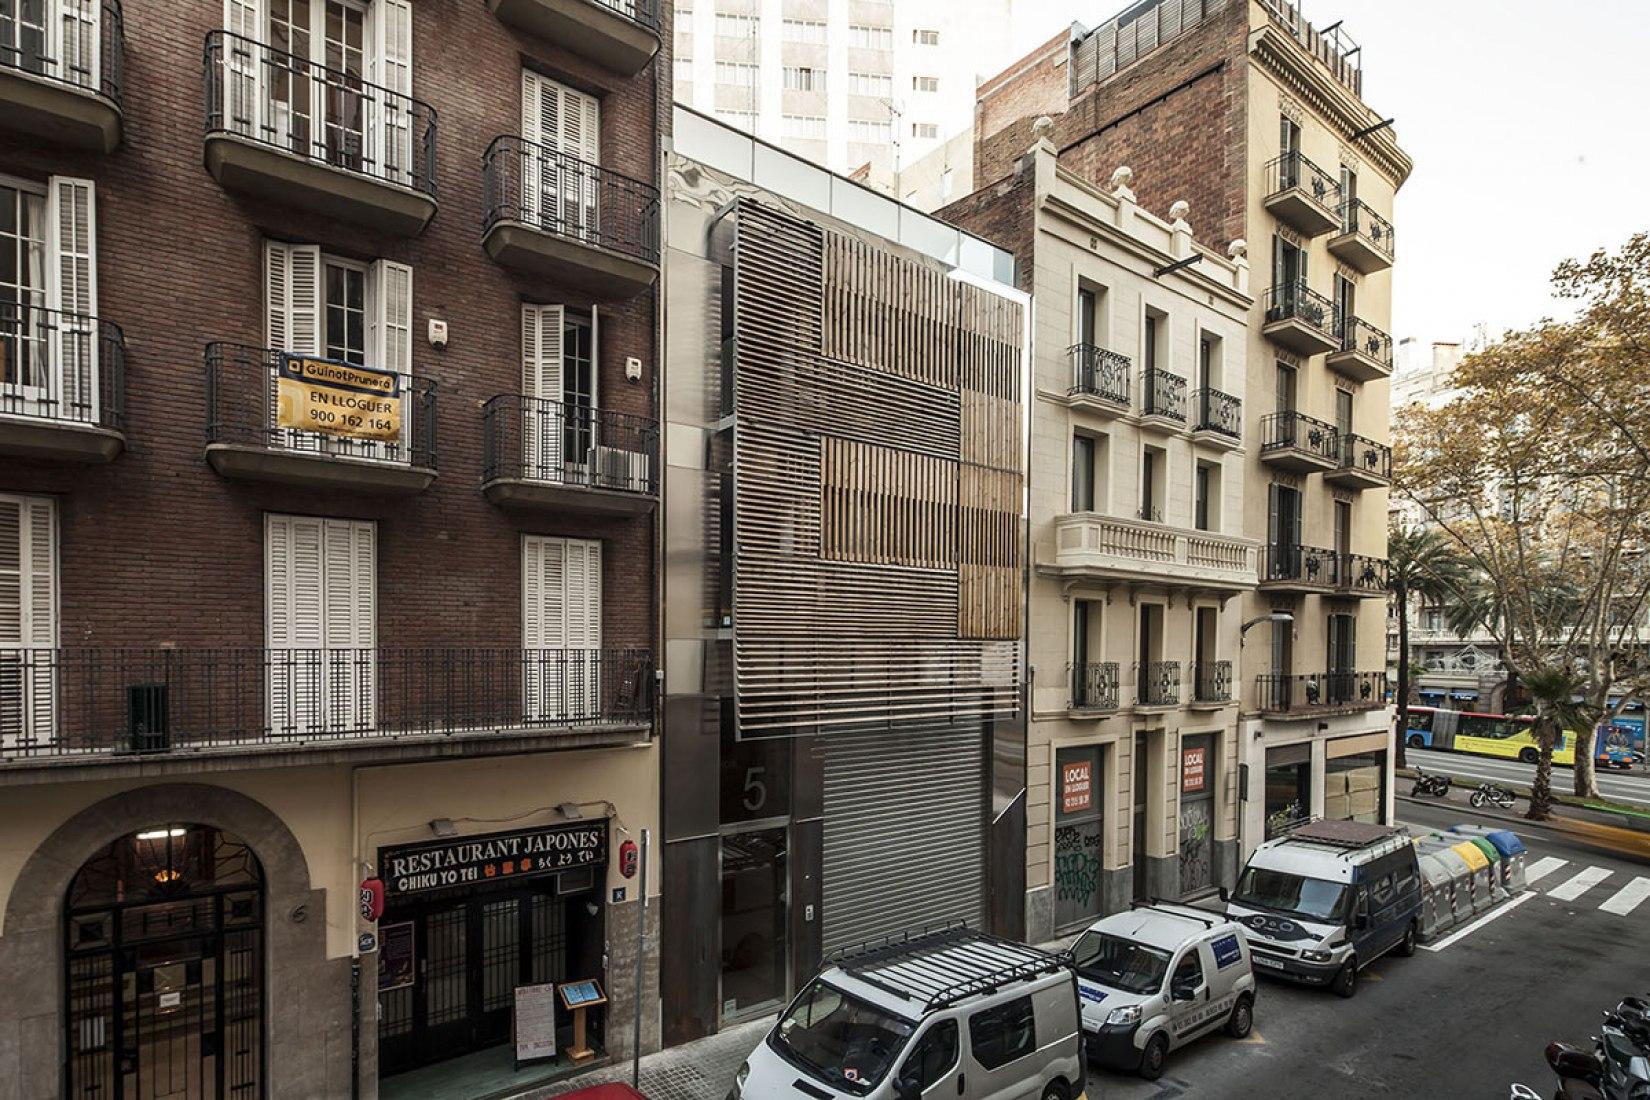 Edificio de Viviendas de Lujo por Josep Lluis Mateo. Fotografía © Adrià Goula.